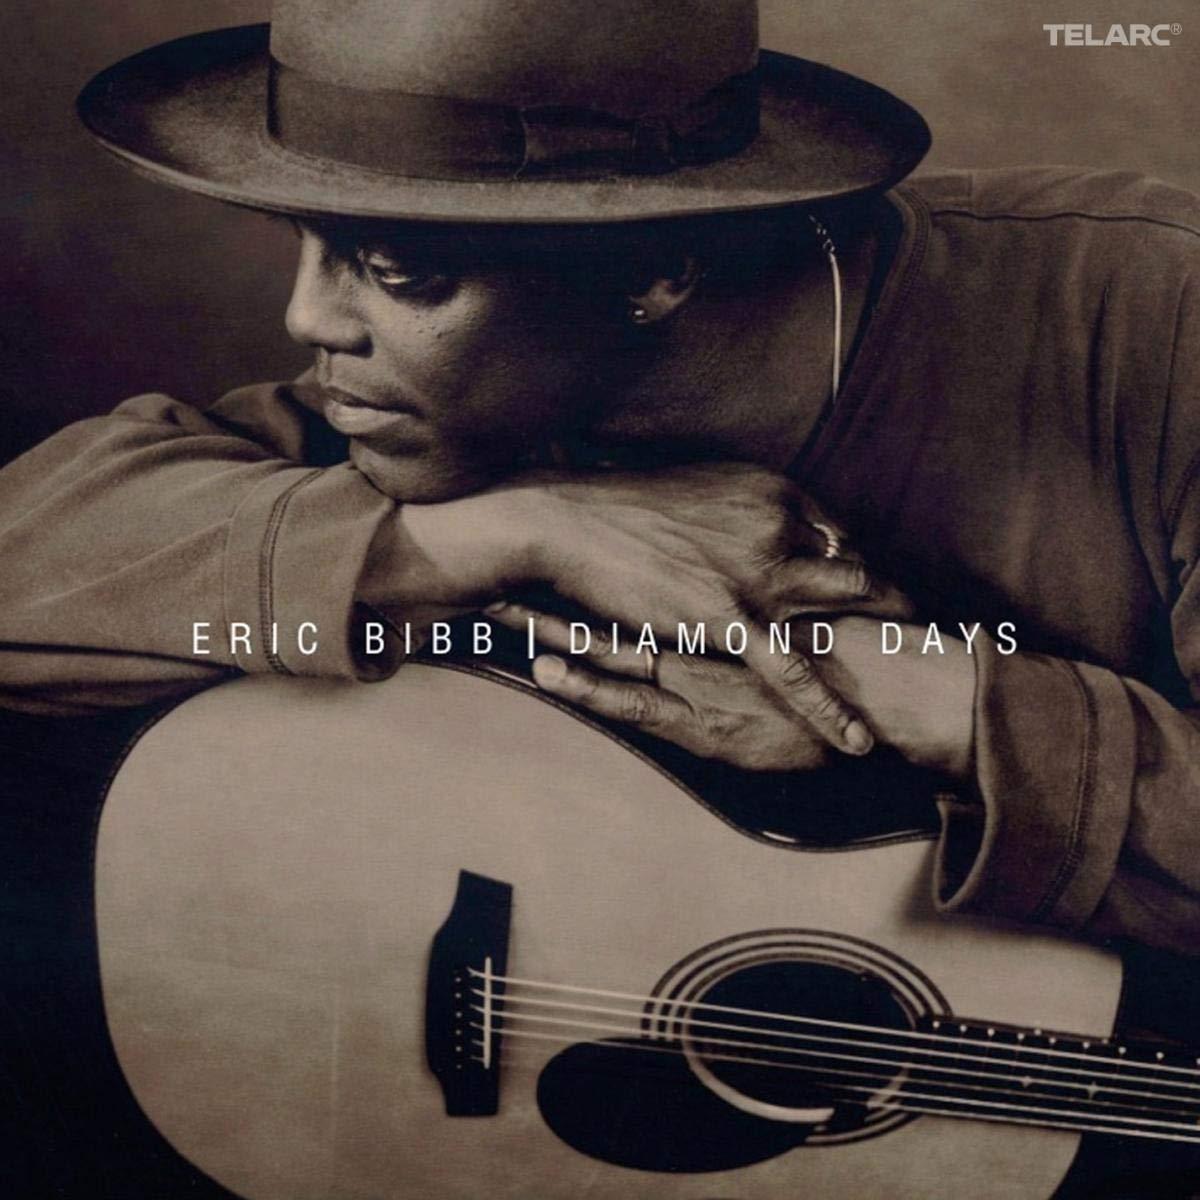 Eric Bibb - Diamond Days (2006) [FLAC] Download